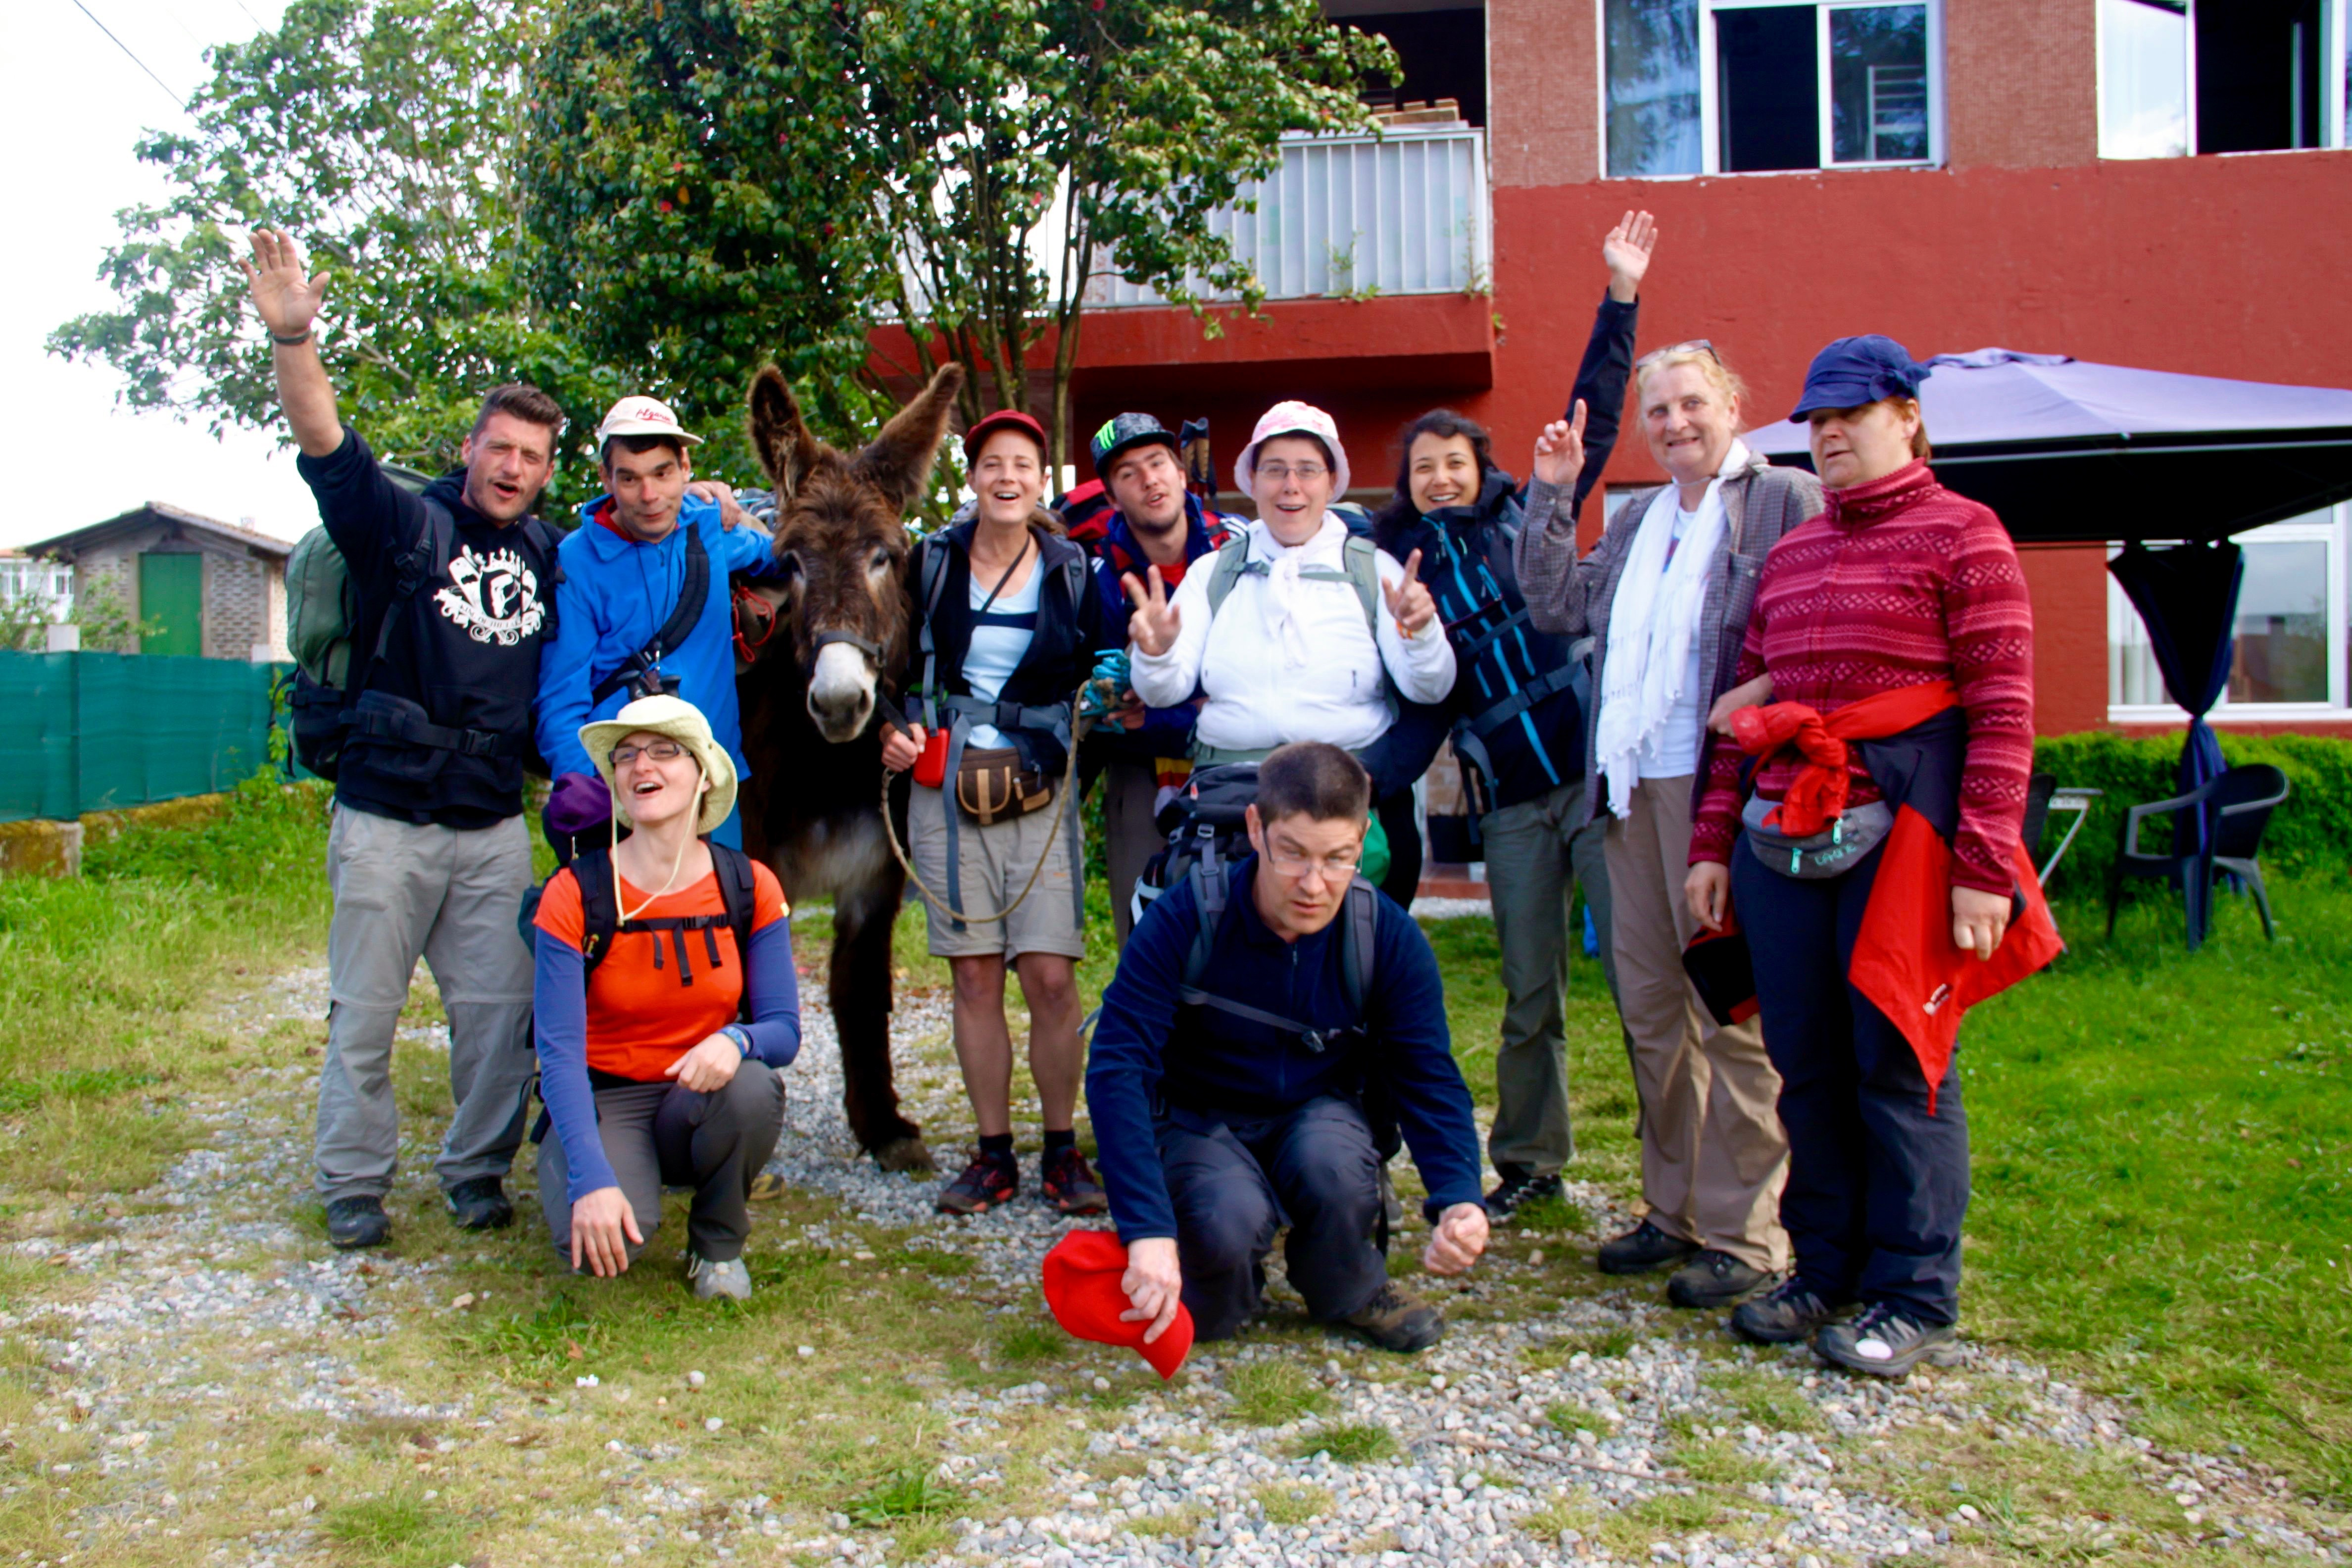 Trekking de l'association Buen Camino - Tous ensemble